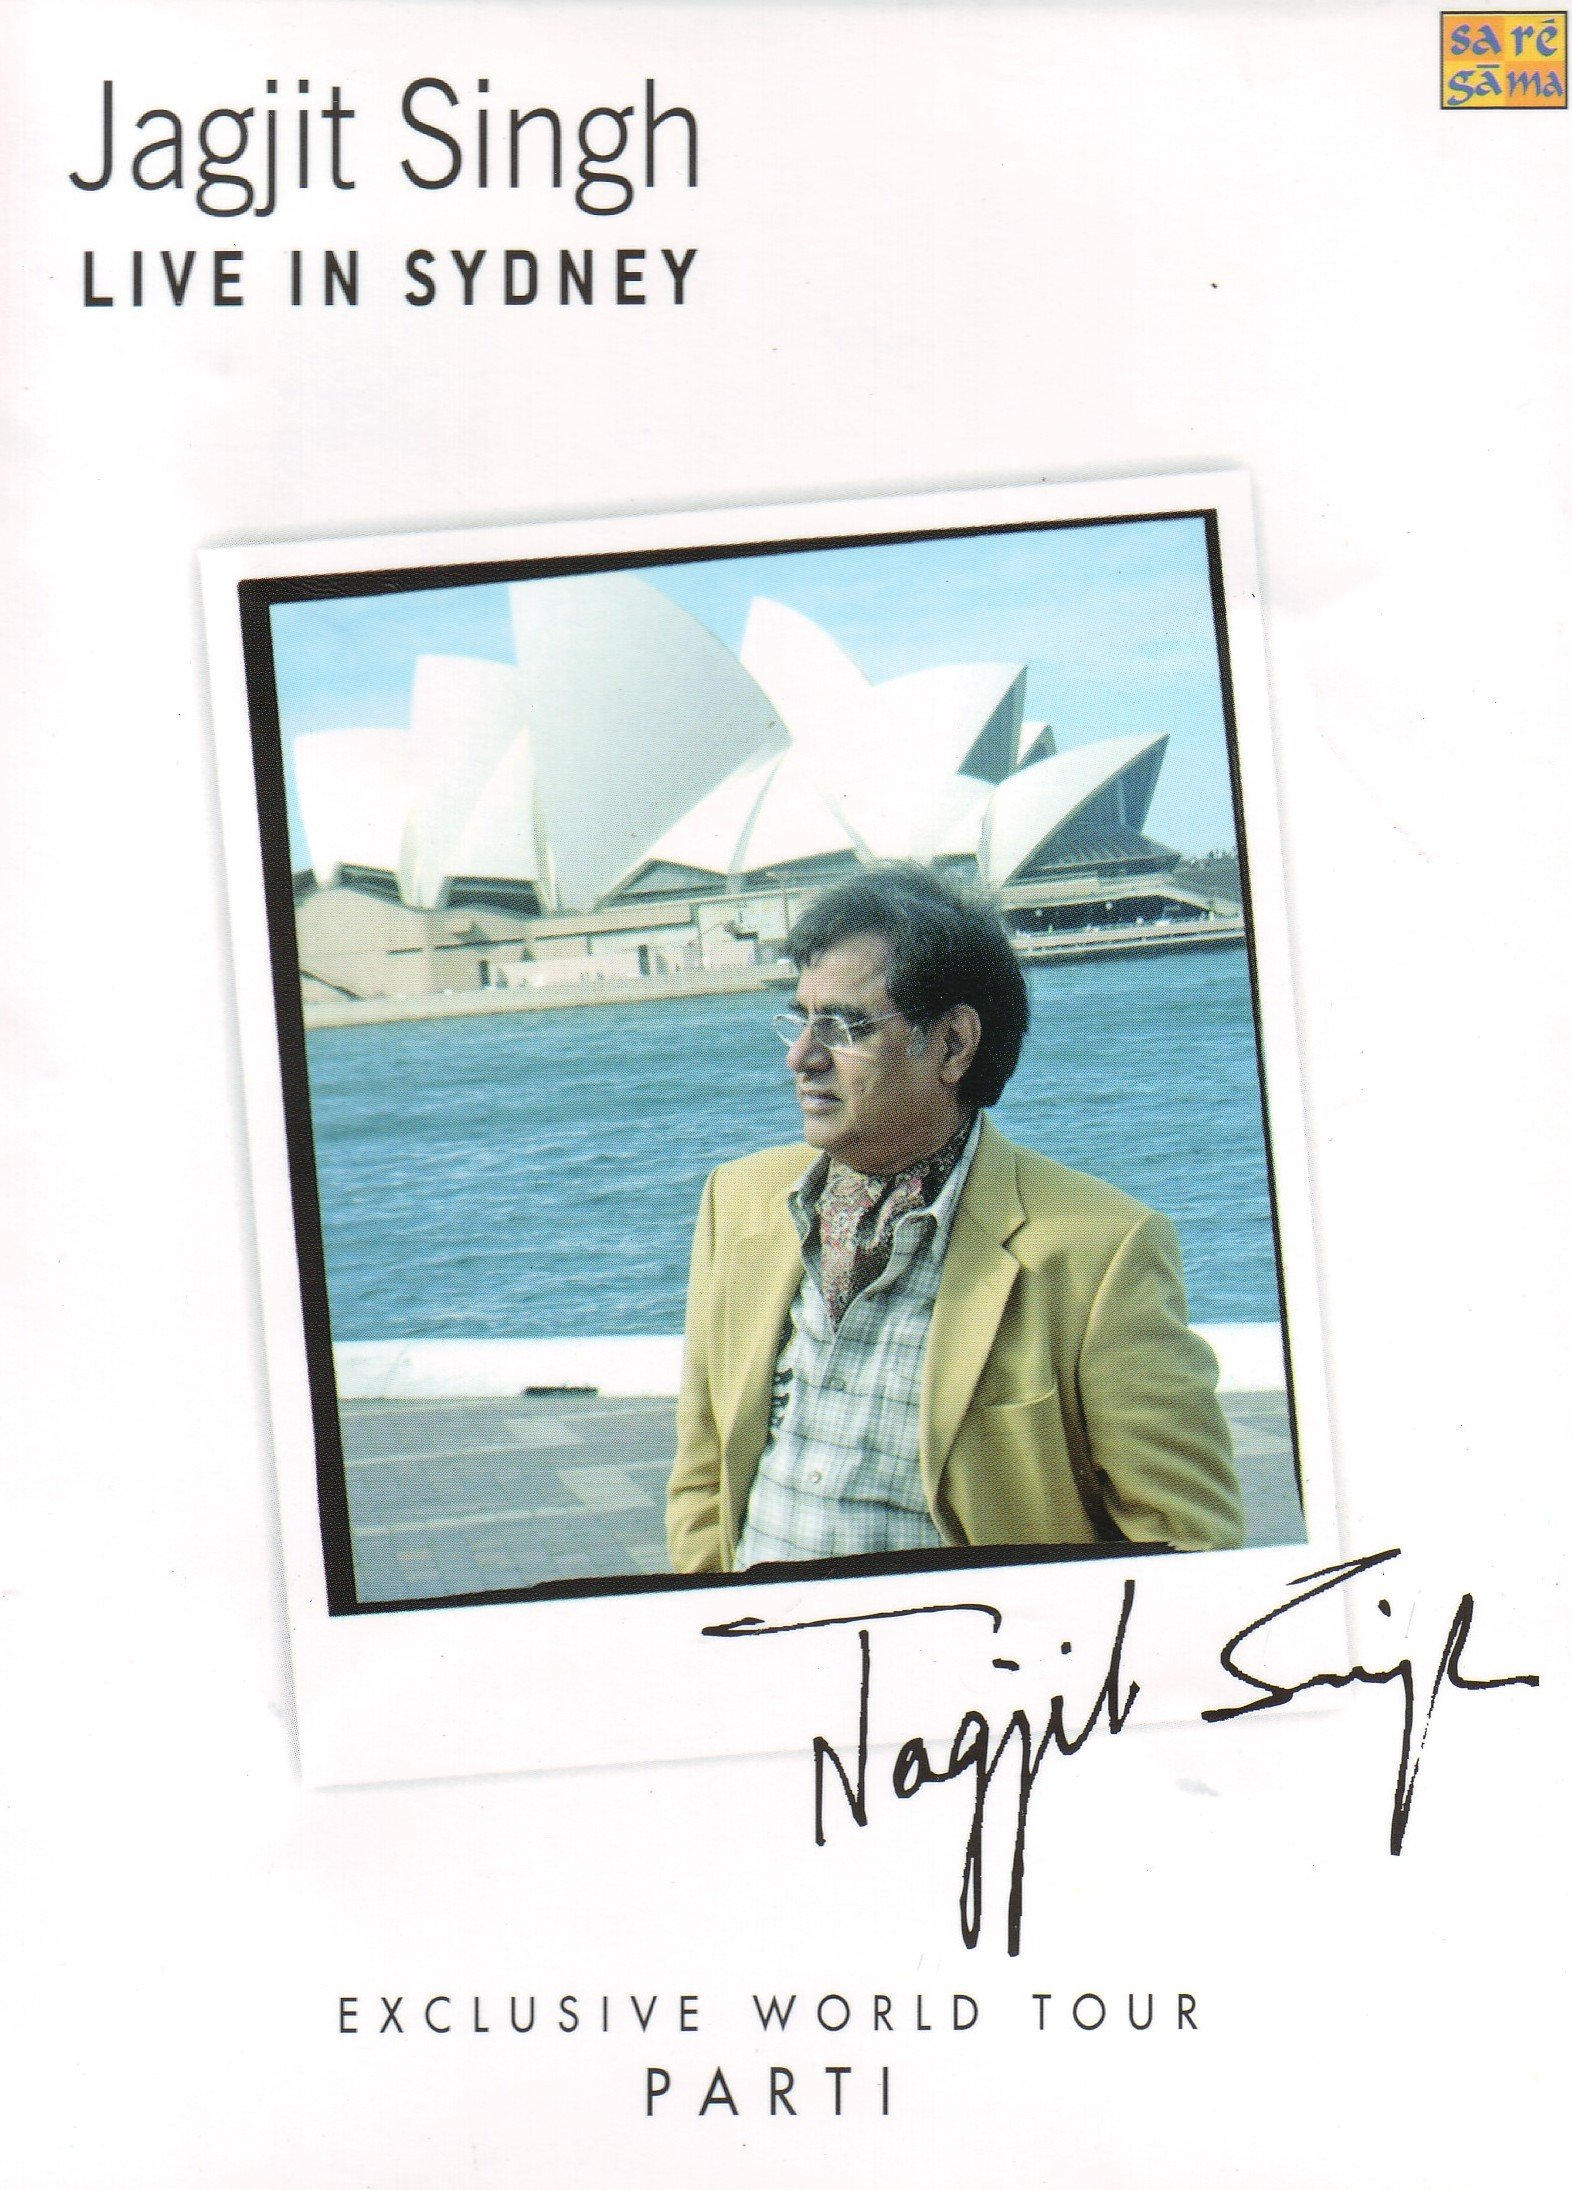 Jagjit Singh Live In Sydney - (CD 1 & 2) by Sony BMG